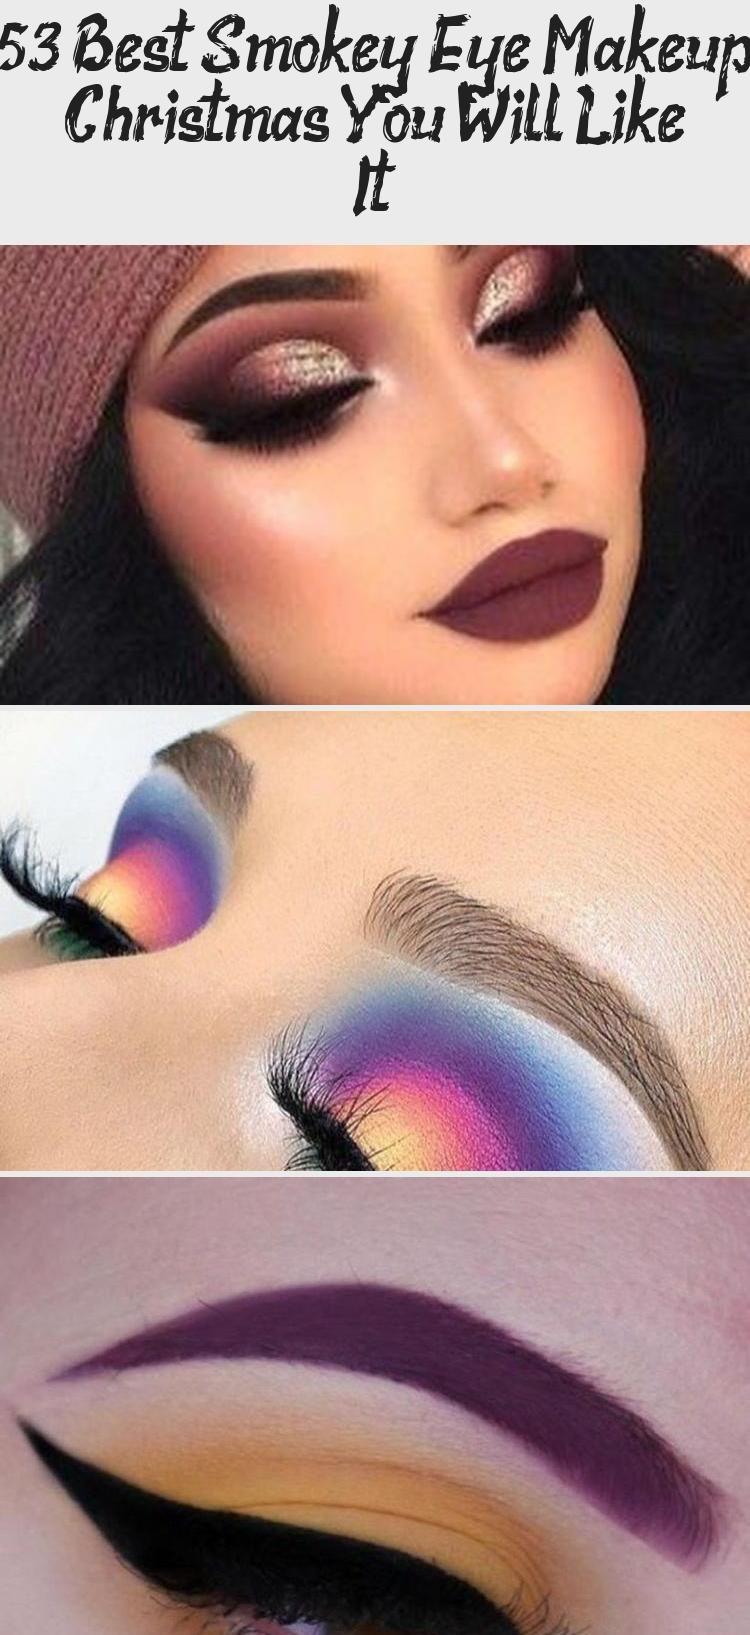 En Blog – En Blog in 2020 | Smokey eye makeup, Makeup ...